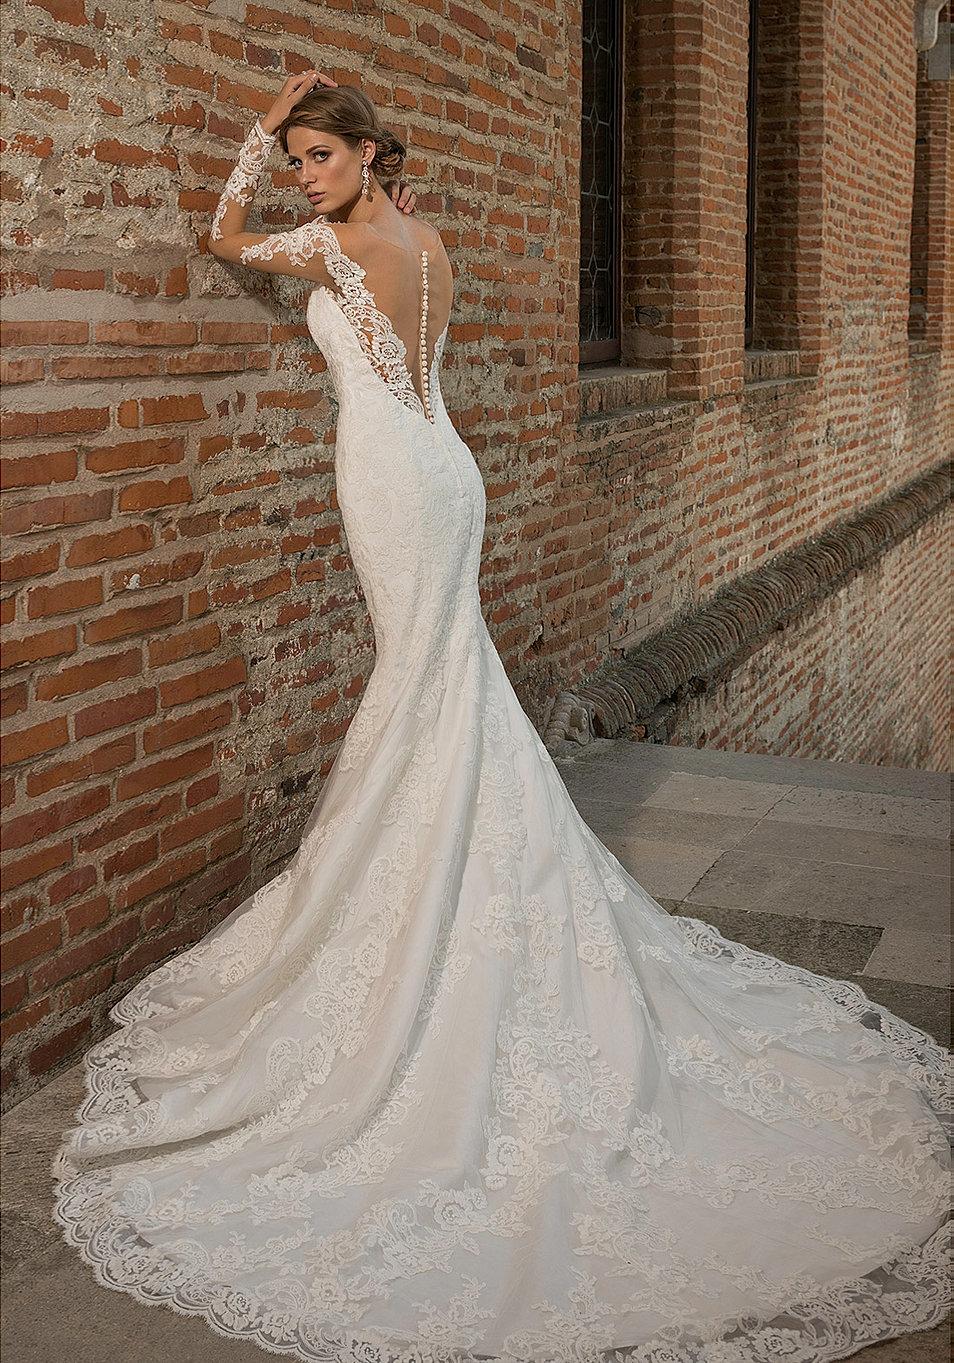 bien savvy luxury wedding dresses luxury wedding dress gift addicted bien savvy 3